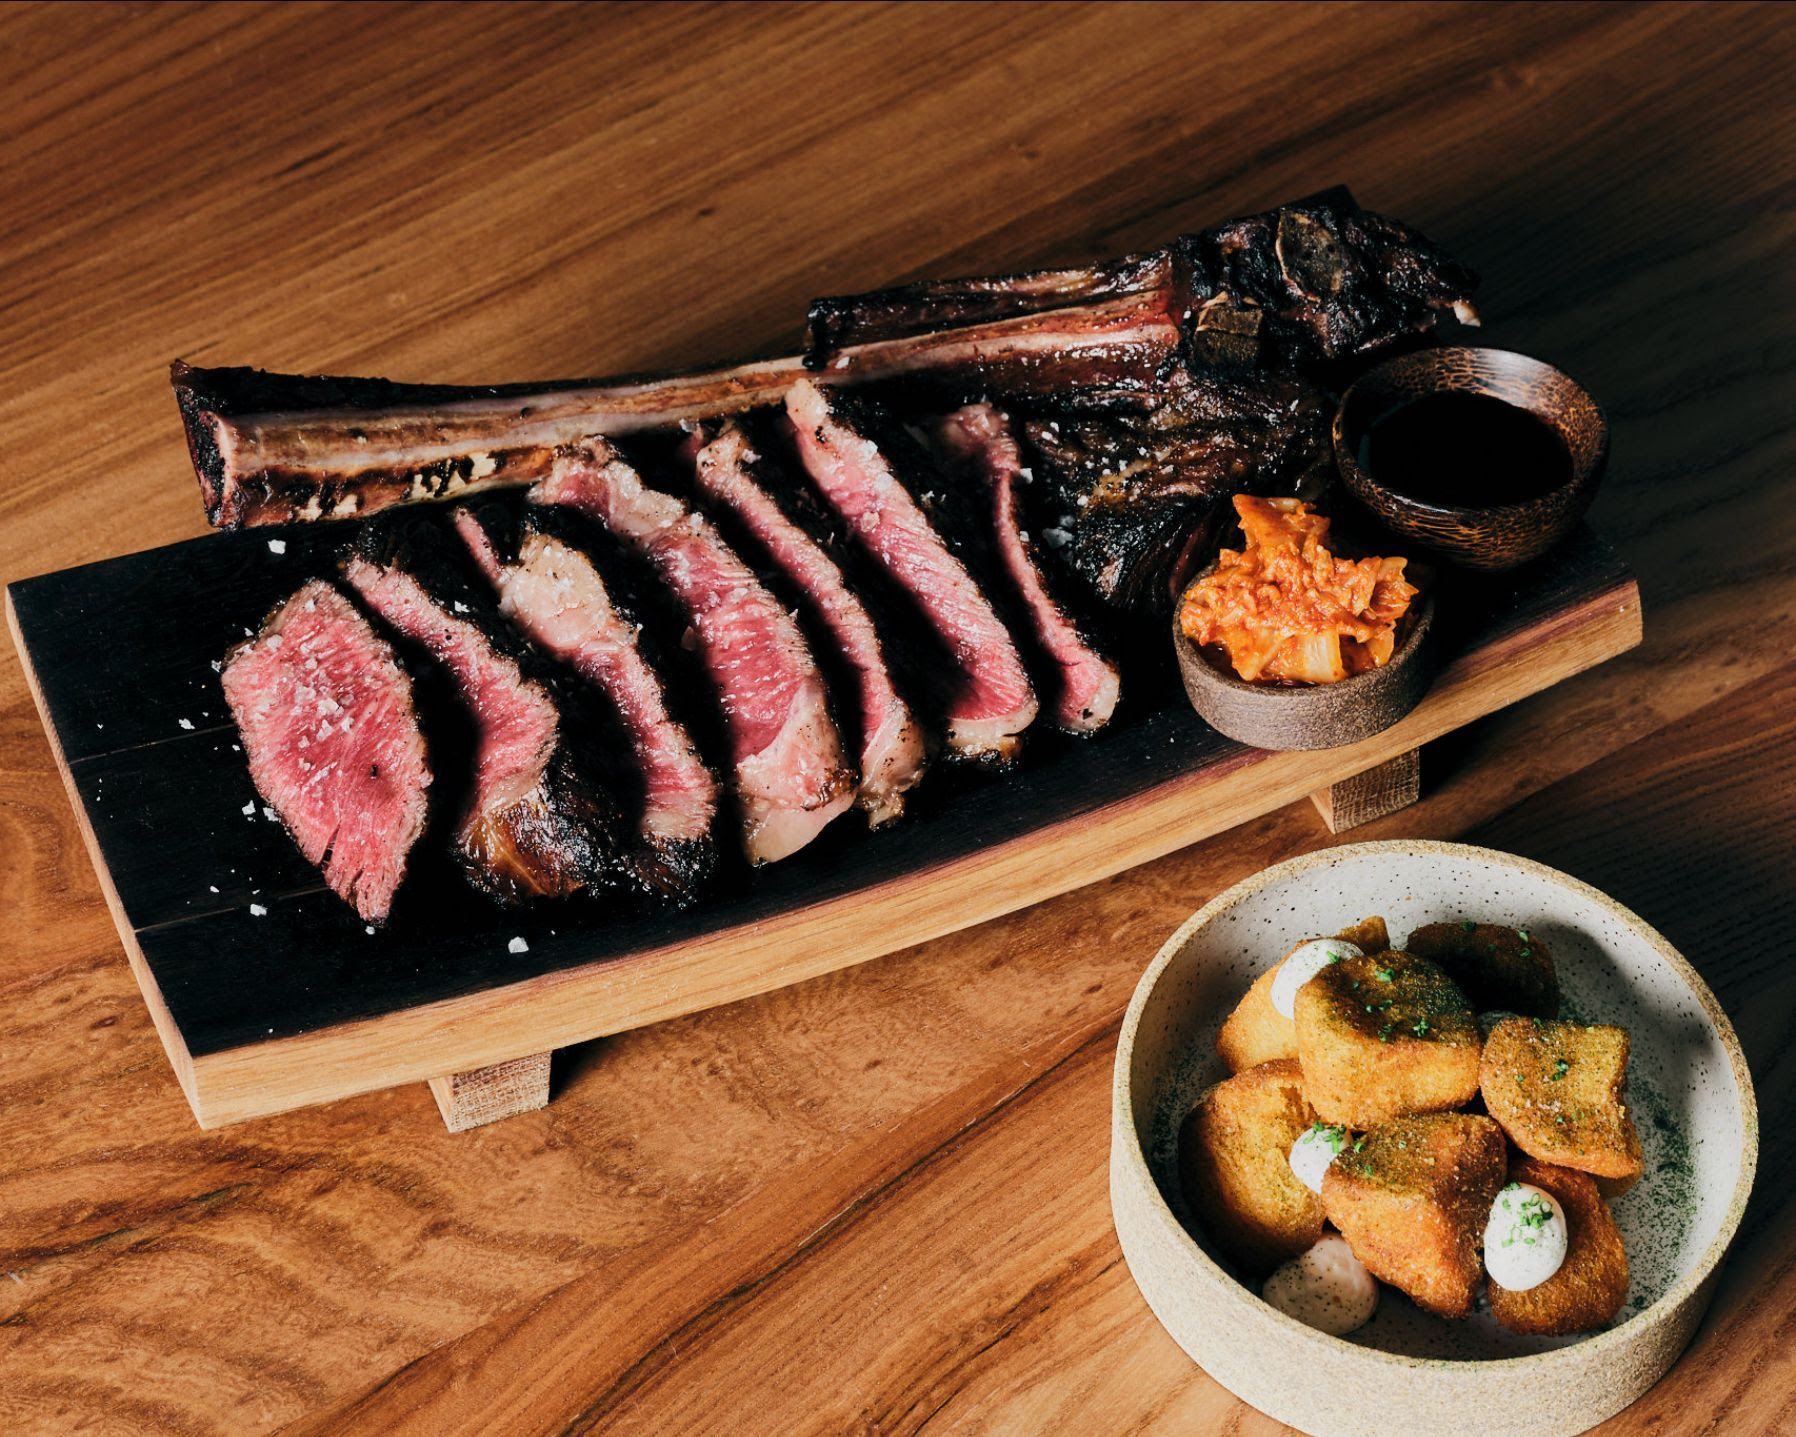 Image result for steakhouse plateware Highlands Steak